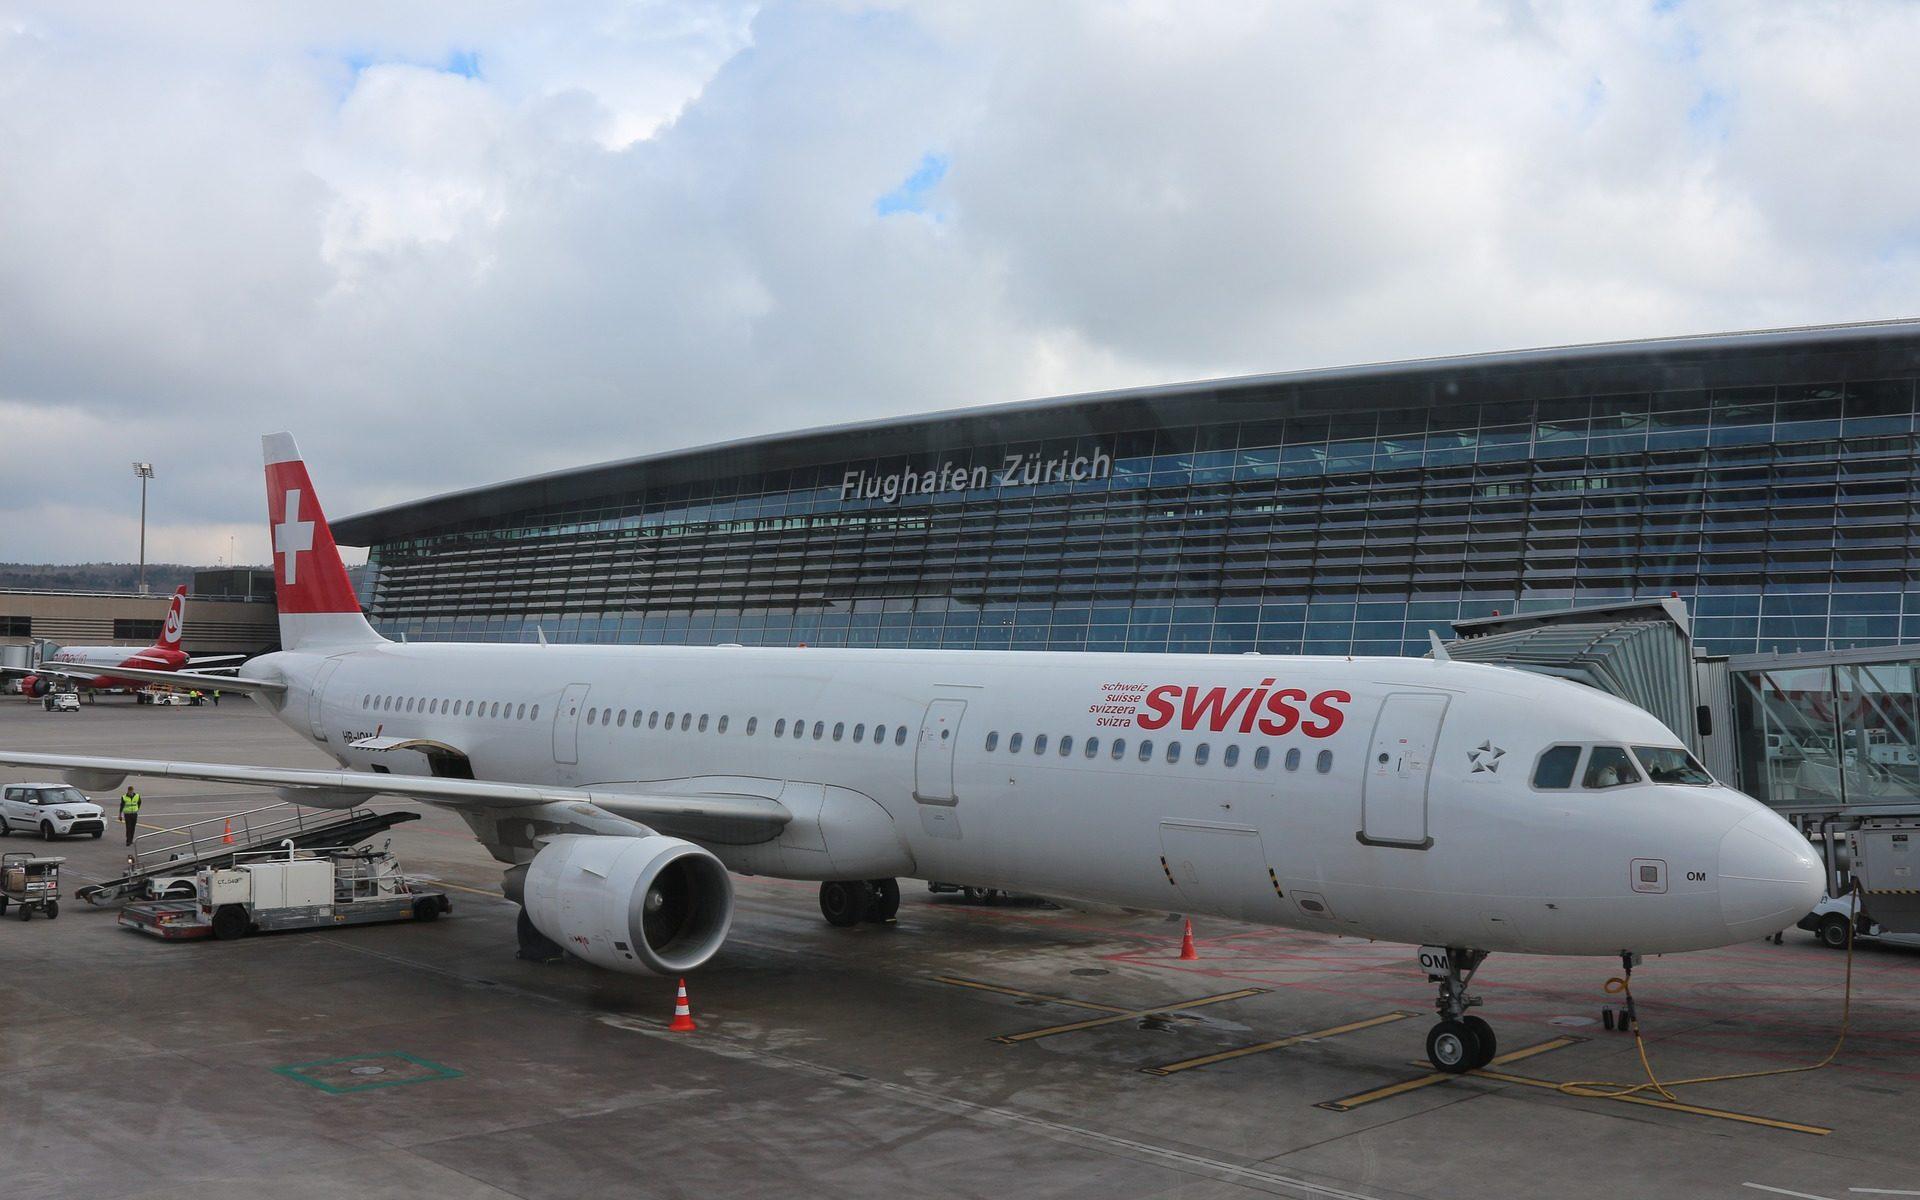 swiss zurich airport 1920x1200 - Flughafen Zürich: Am ZRH finden seltsame Flugmanöver statt